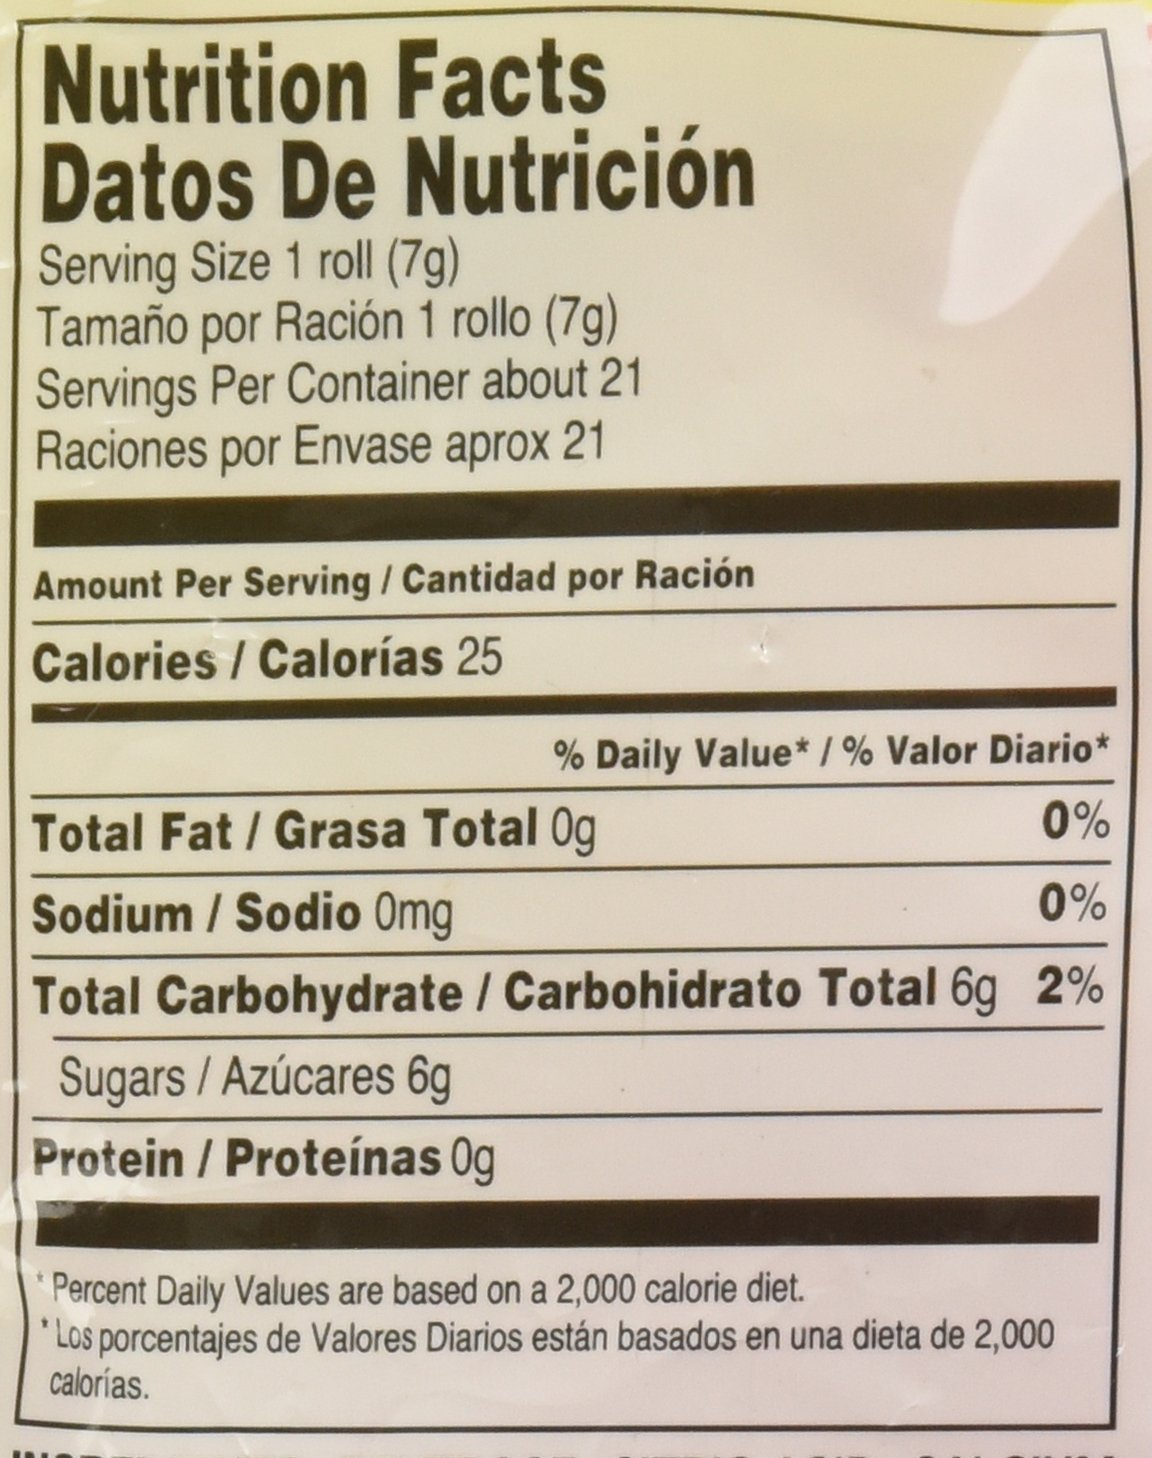 Amazon.com : Smarties Original: 5.5 oz (155 g) Bag (Pack of 2) : Grocery & Gourmet Food